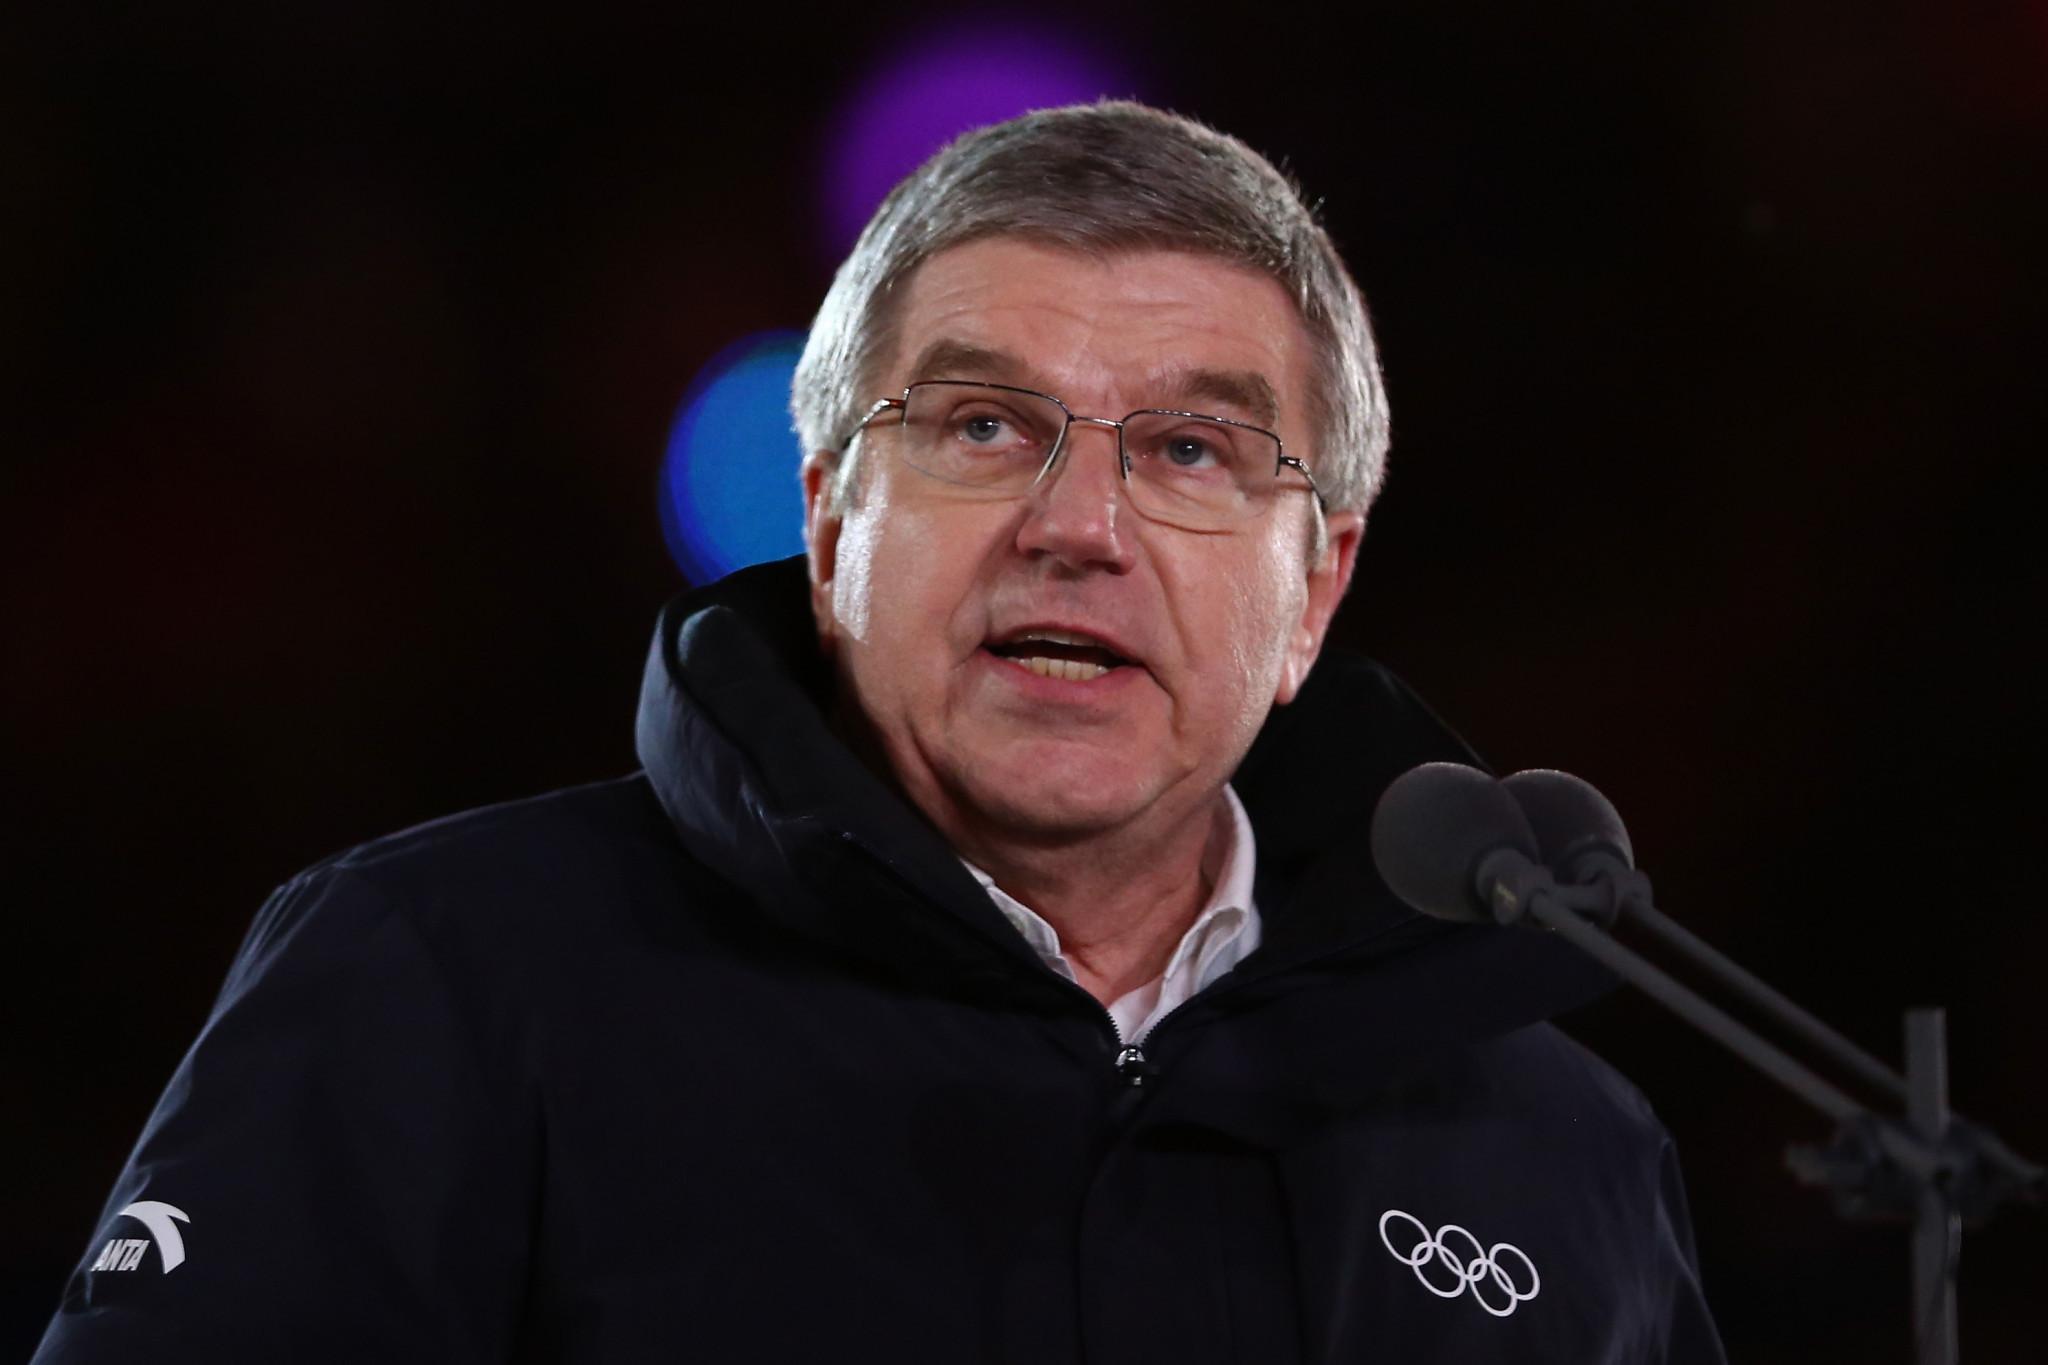 South Korea to honour Bach with prestigious award following Pyeongchang 2018 Olympics